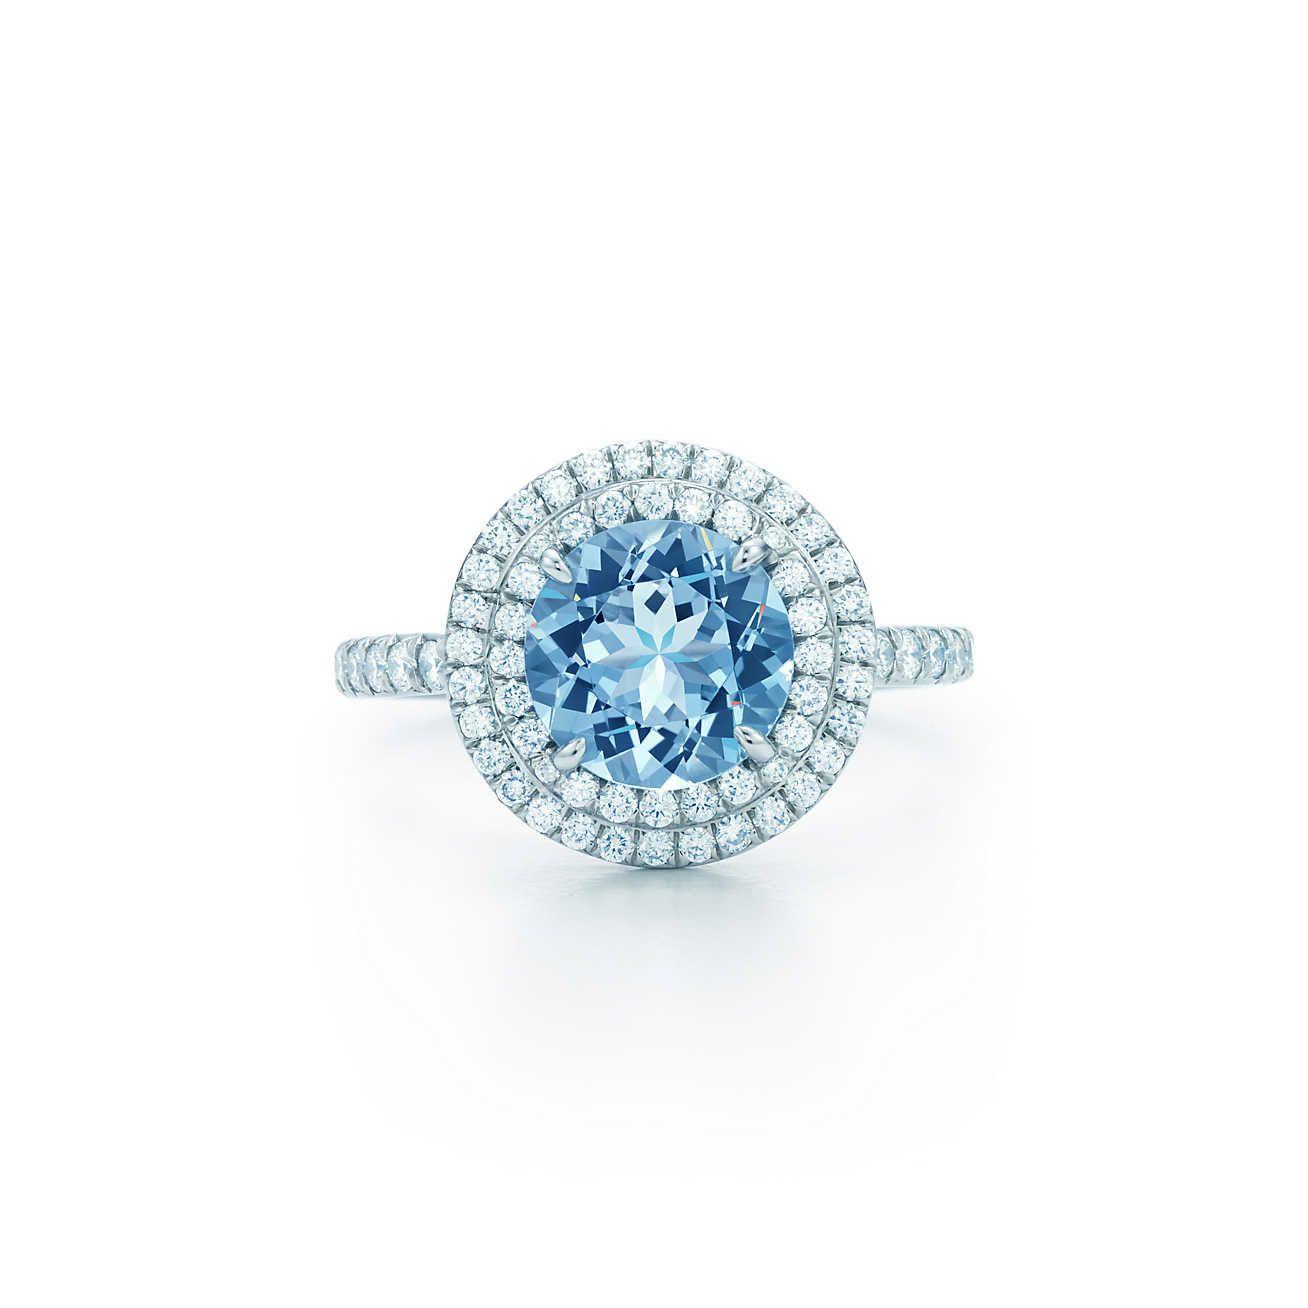 Ring Tiffany Wedding Rings Unconventional Engagement Rings Diamond Engagement Rings